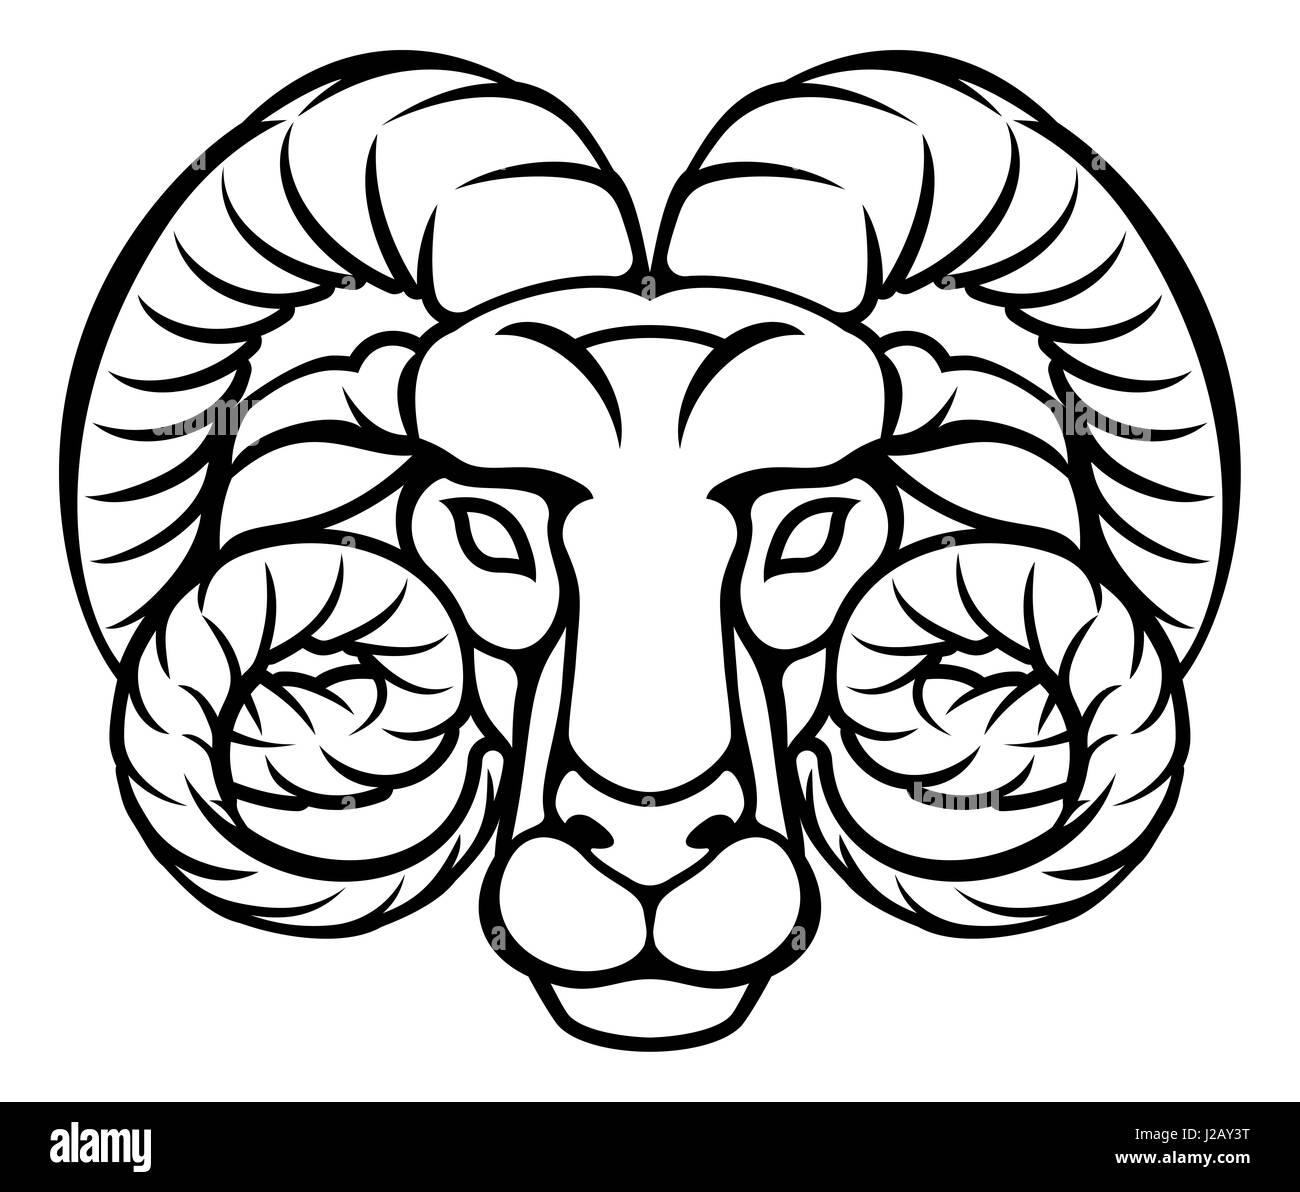 Astrology signs circular Aries ram zodiac horoscope symbol - Stock Image